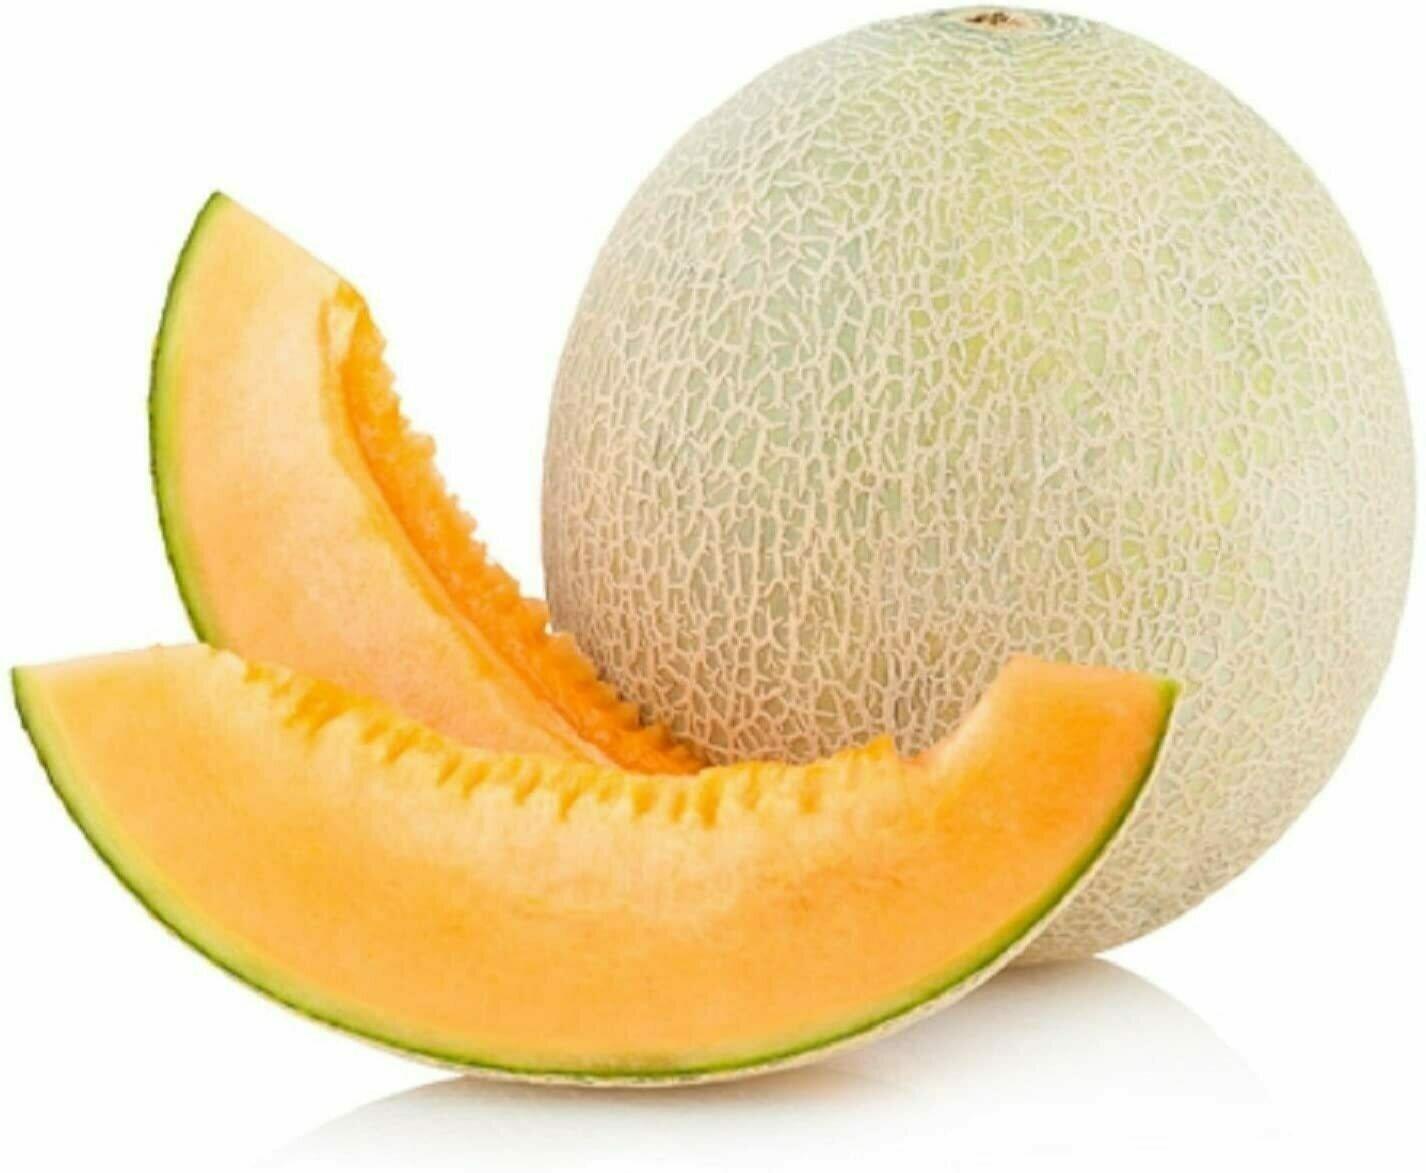 * Cantaloupe 1 Piece